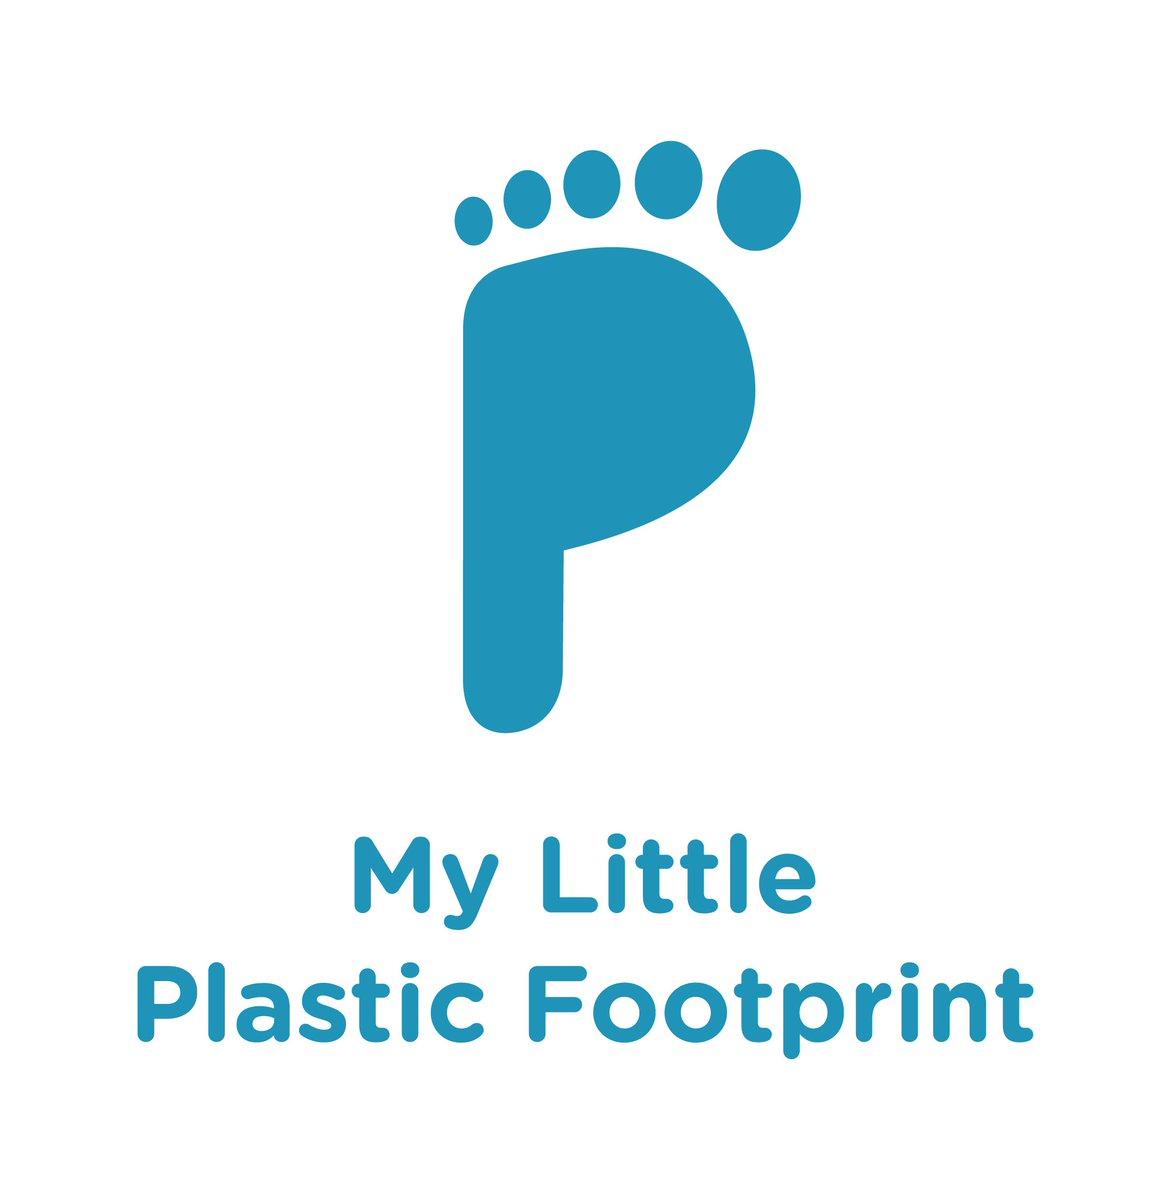 mylittleplasticfootprint.jpg